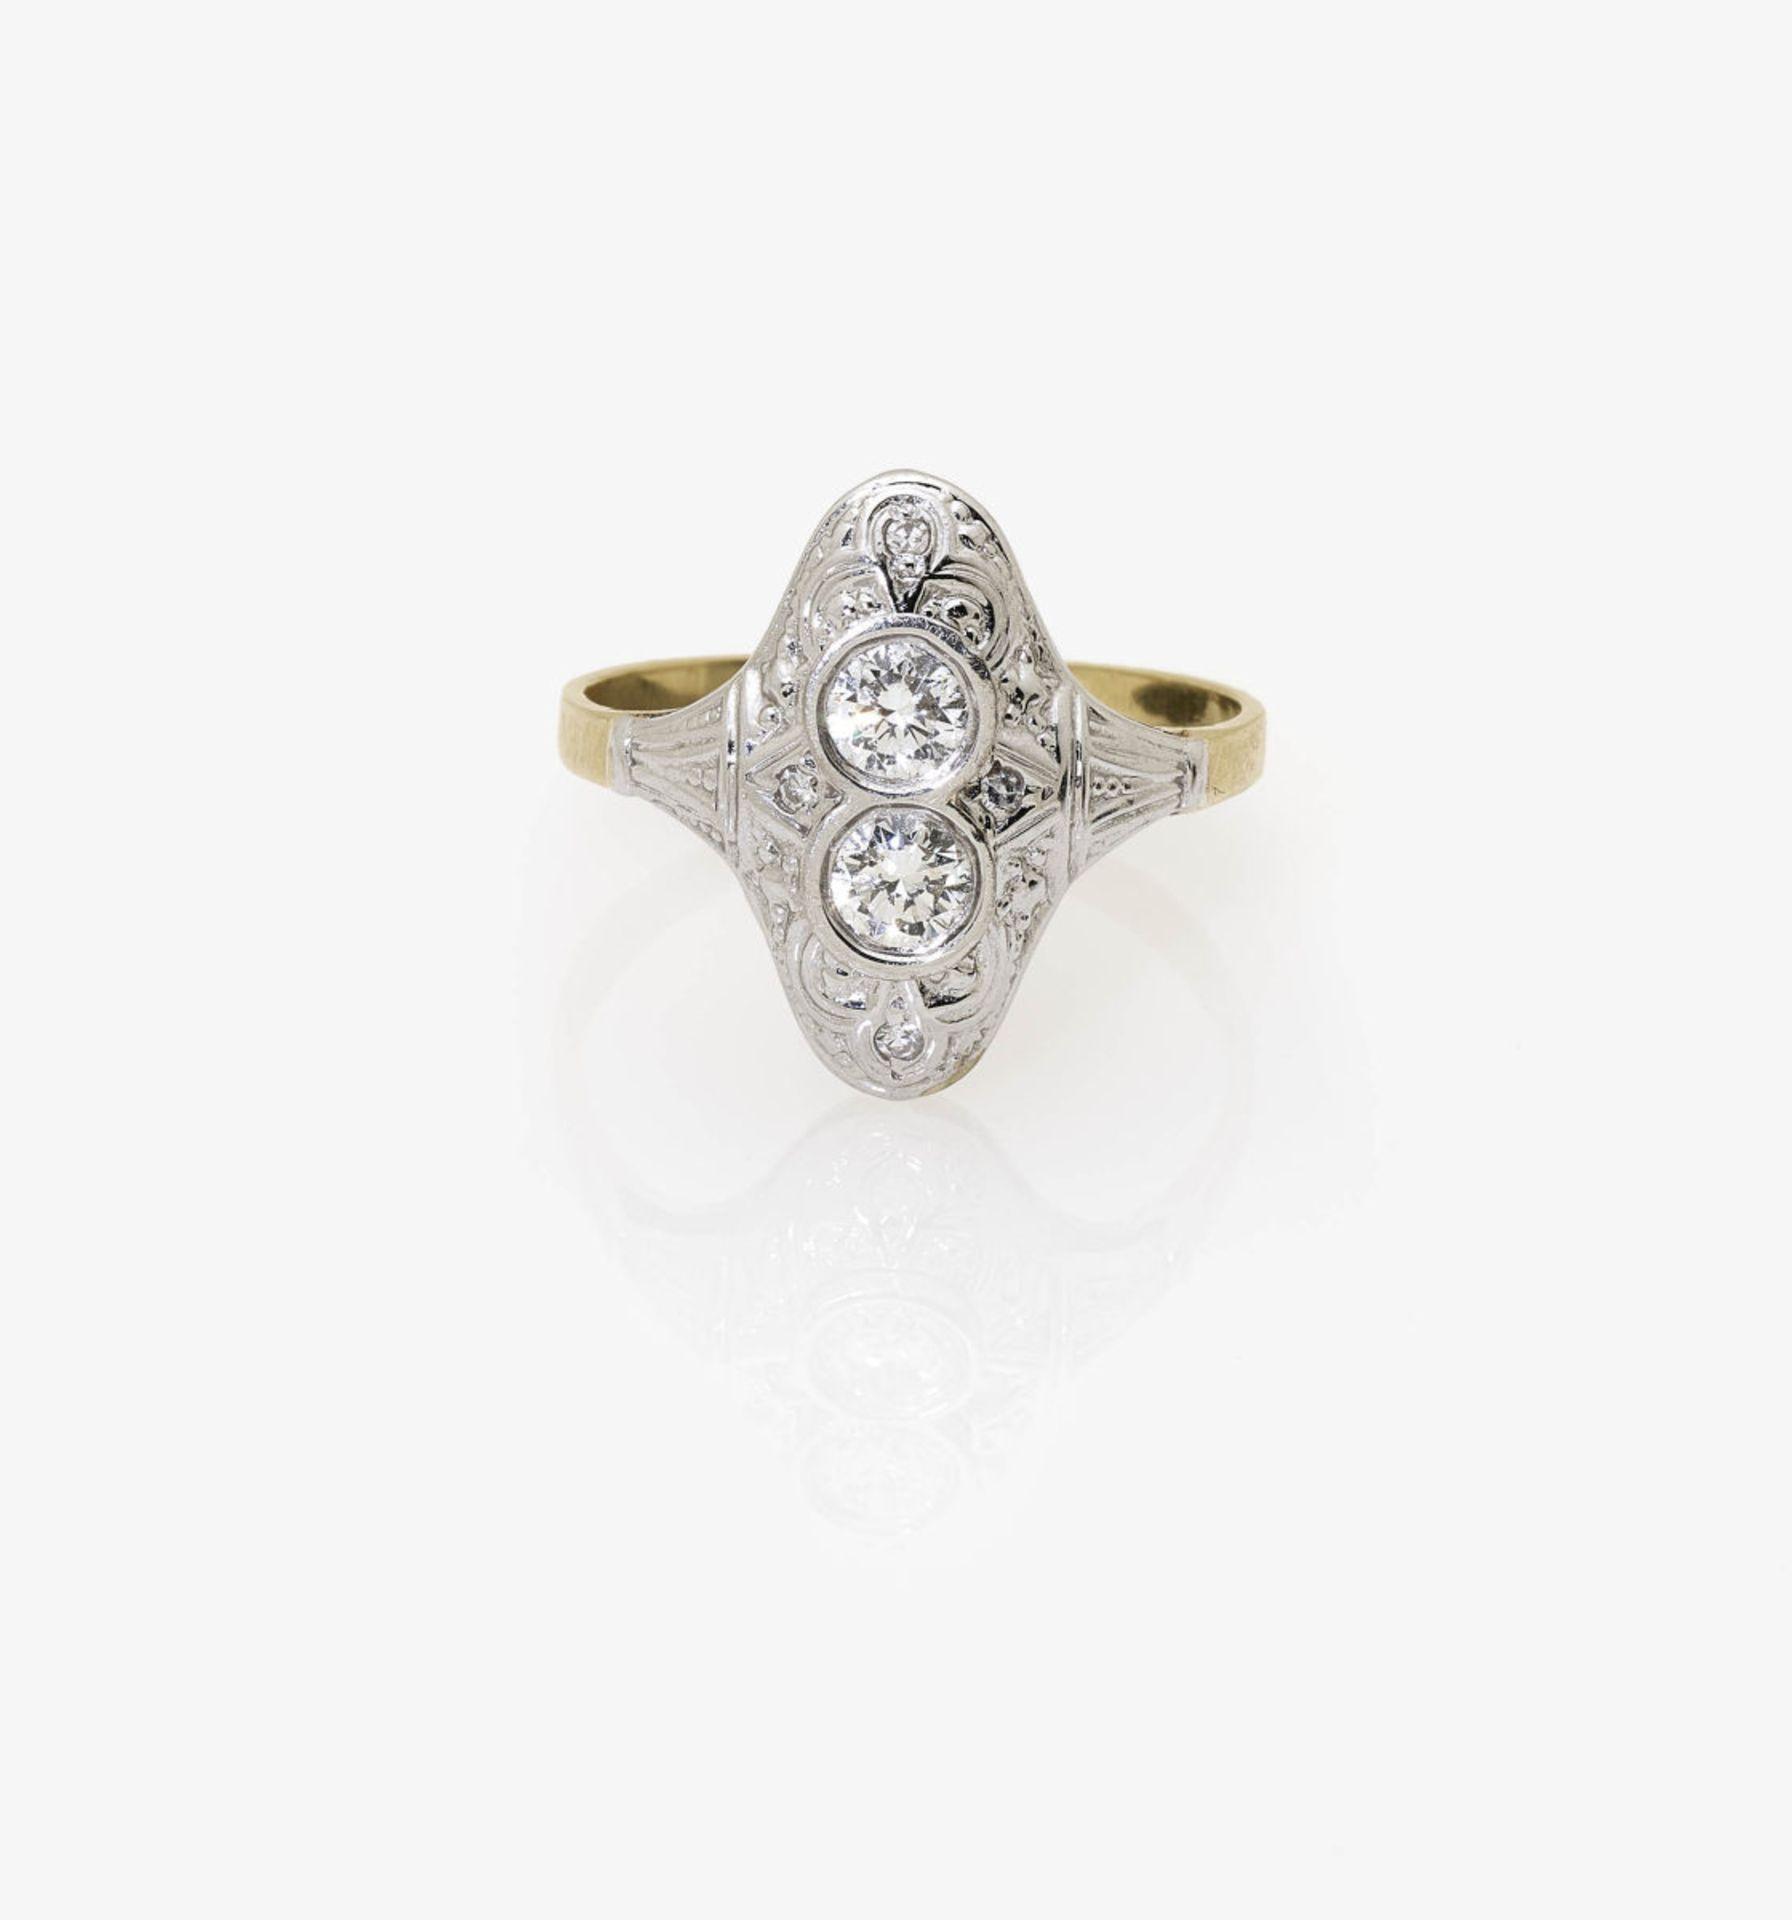 Los 1024 - A Diamond Ring